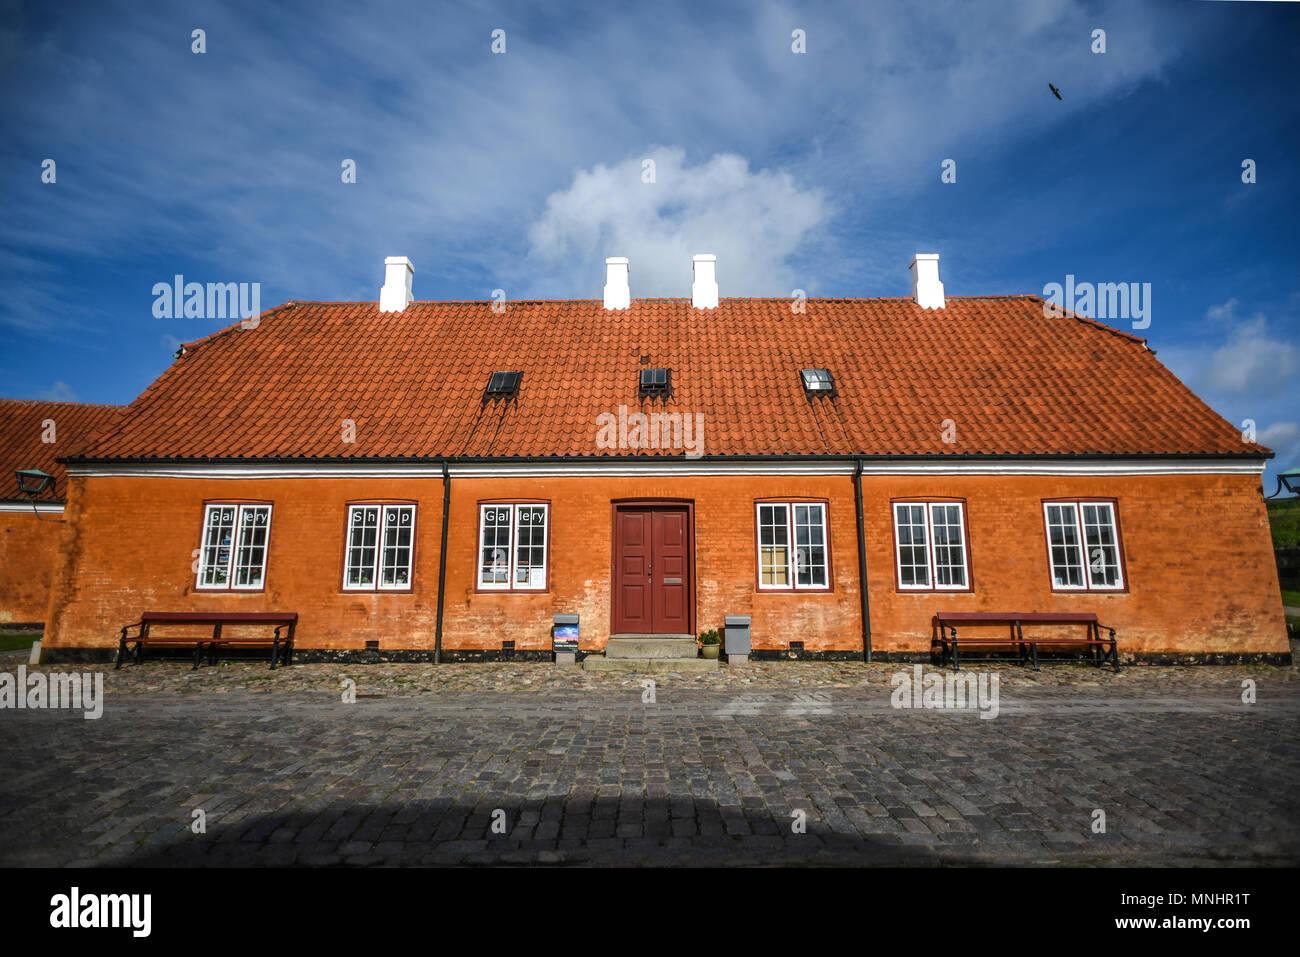 Buildings of Kronborg castle in Denmark, a red brick building. - Stock Image